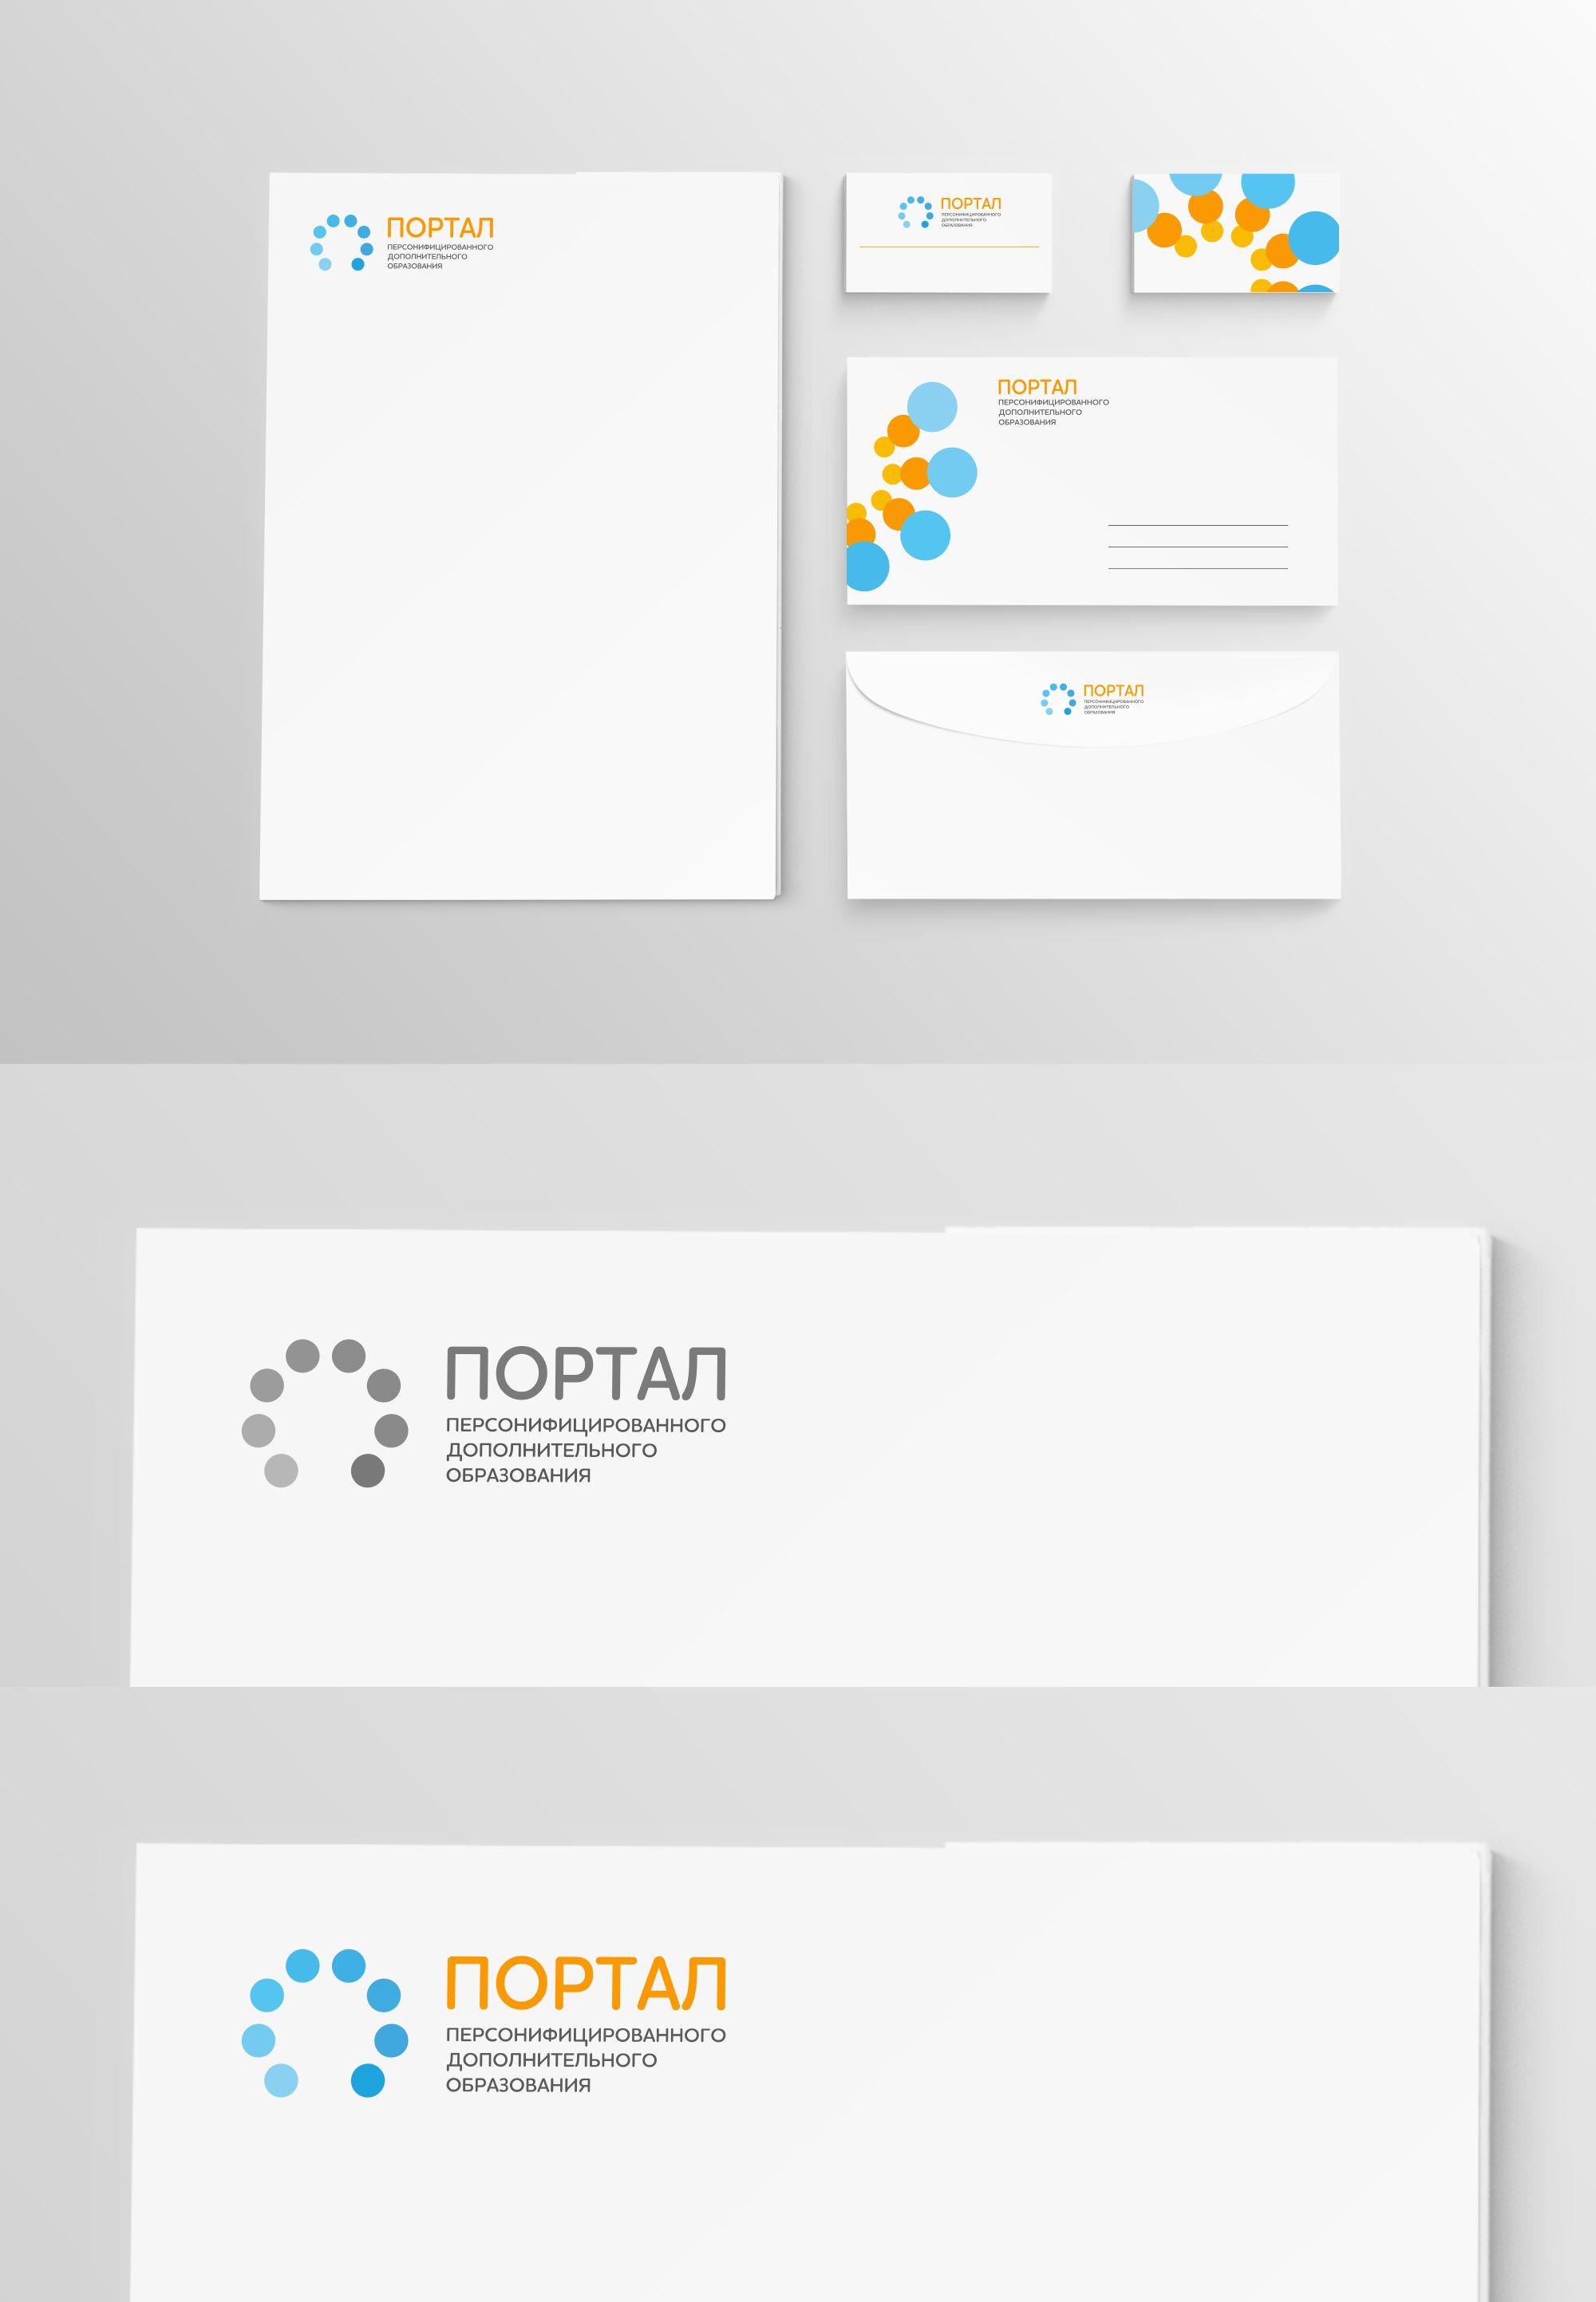 Логотип для интернет-портала фото f_1395a578d3642d15.jpg